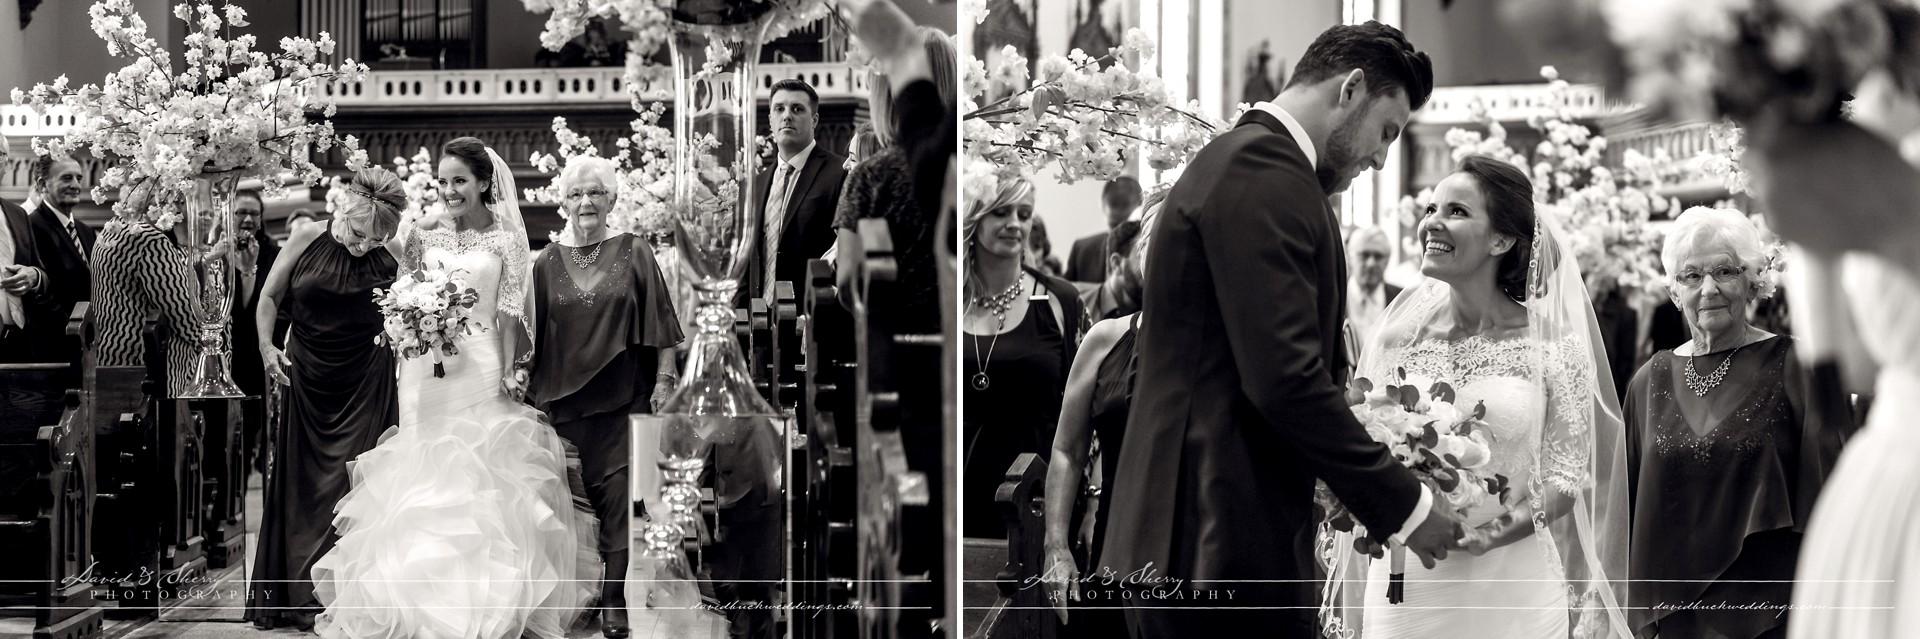 Sarnia_Wedding_Photography_013